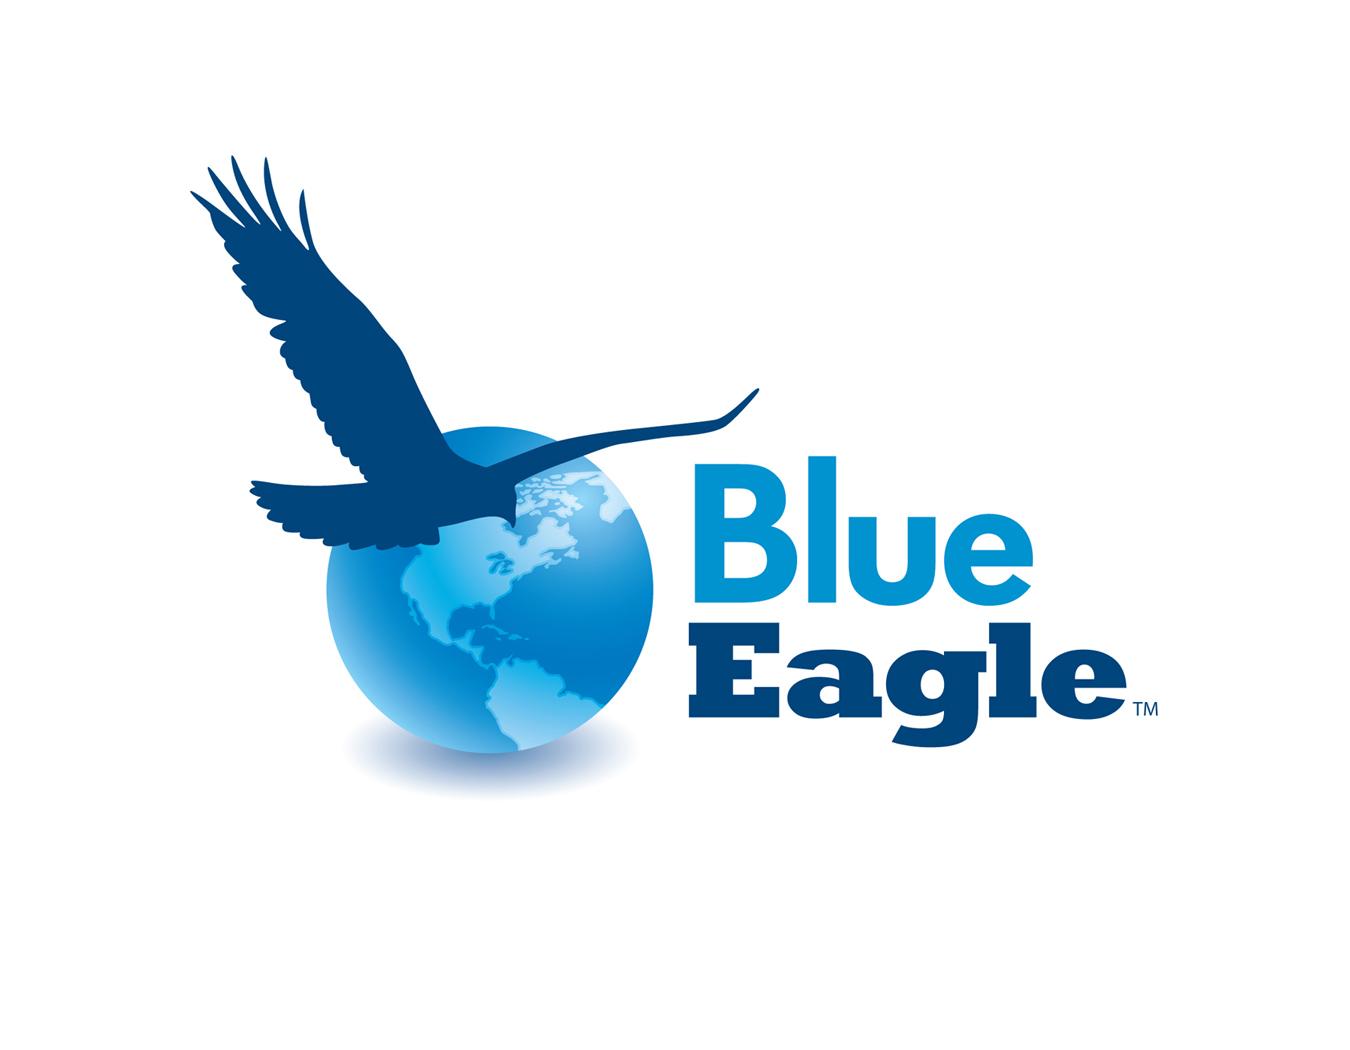 Blue White Eagle